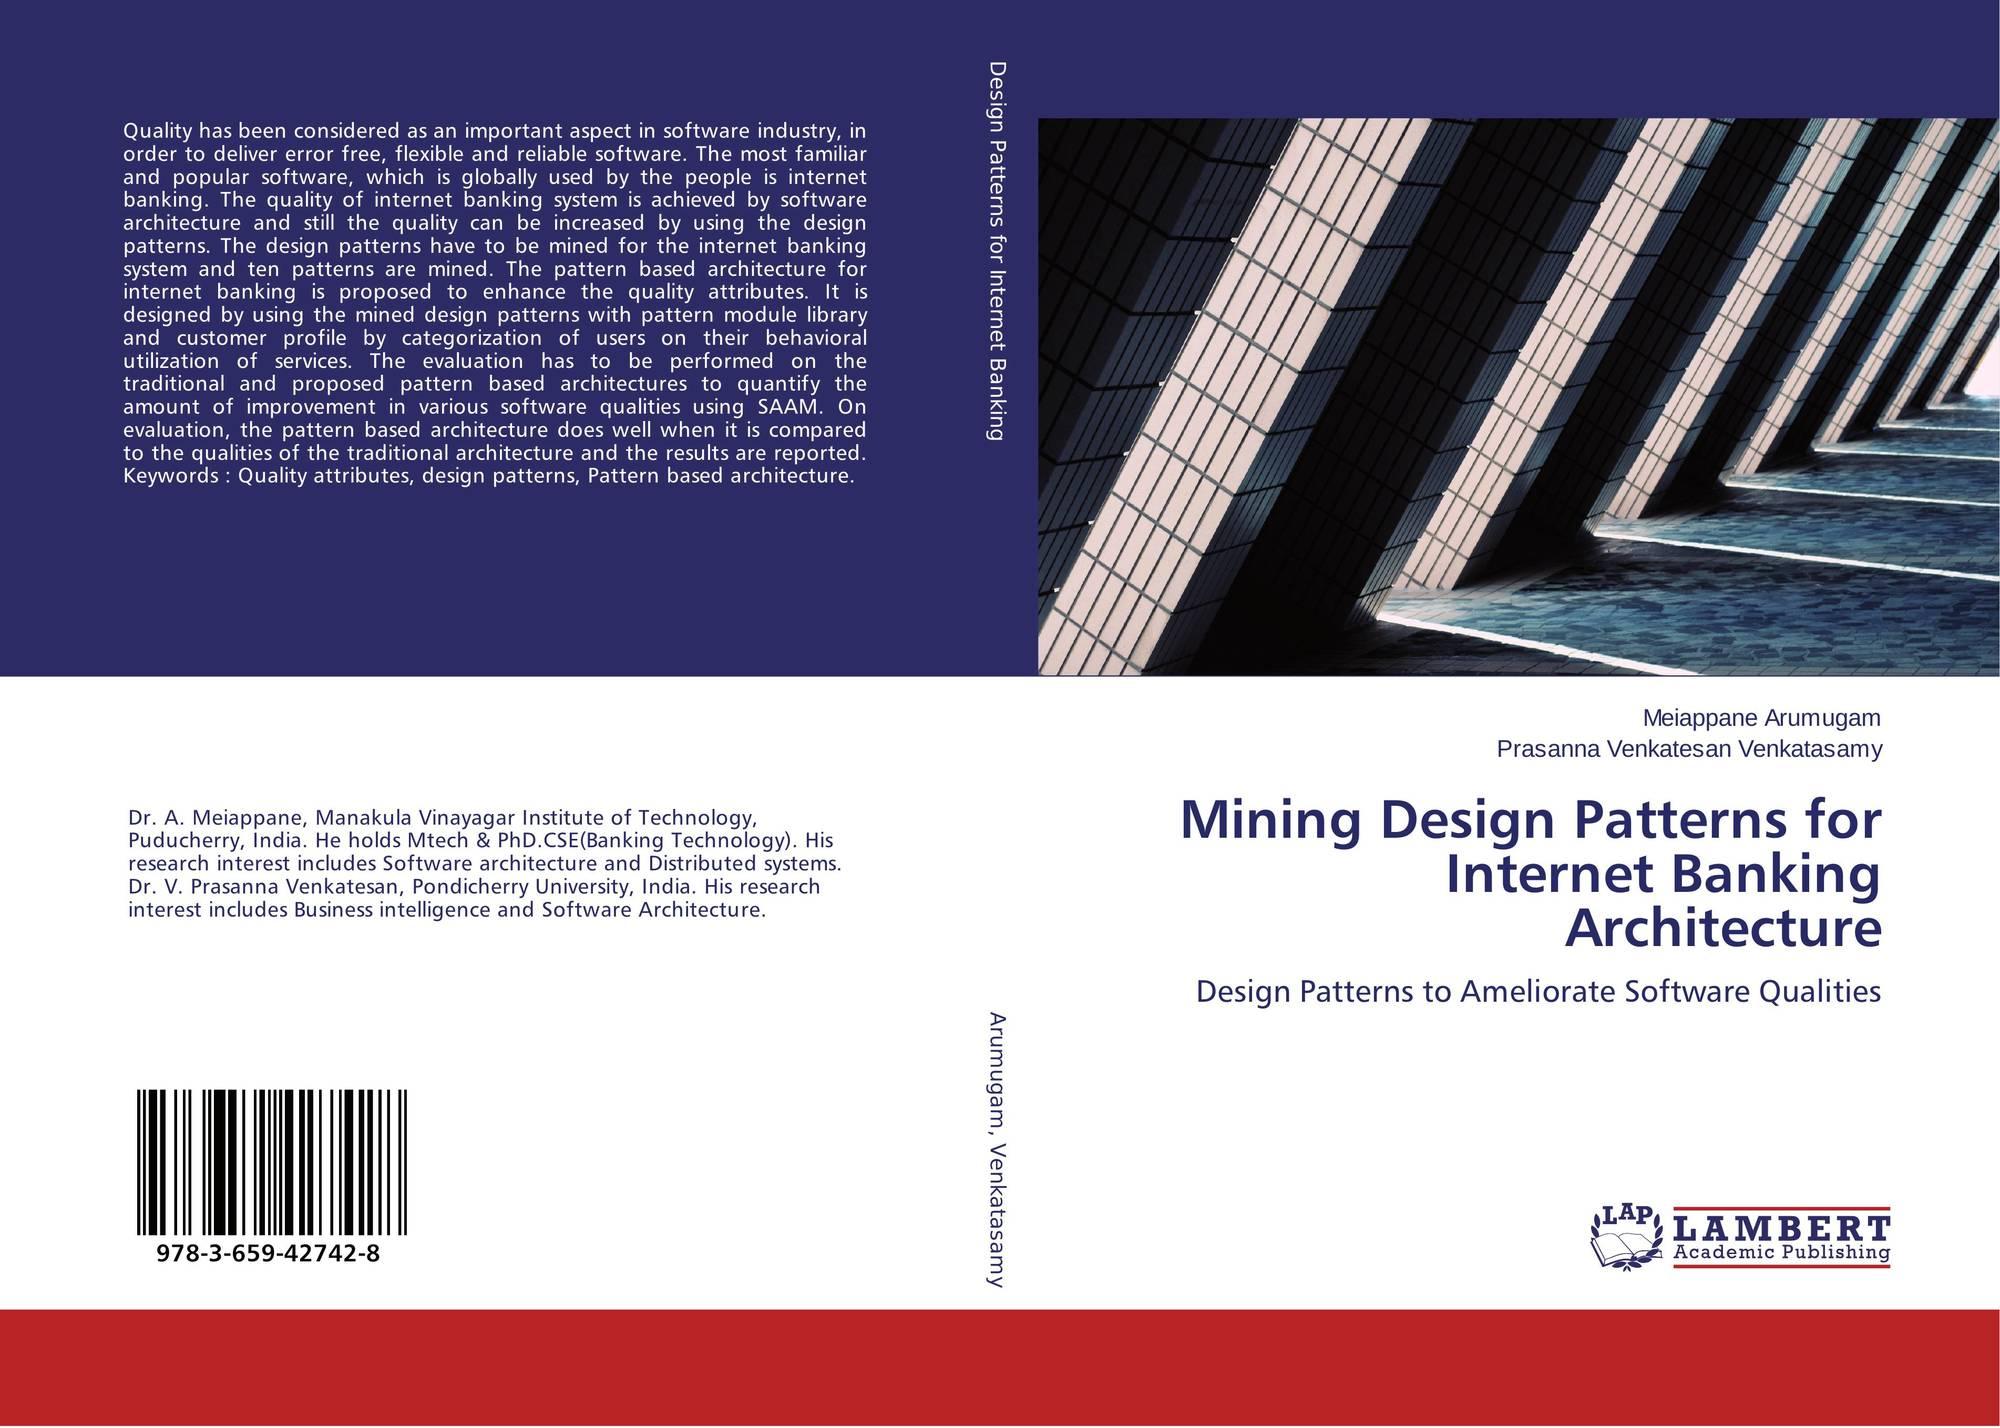 Mining Design Patterns For Internet Banking Architecture 978 3 659 42742 8 365942742x 9783659427428 By Meiappane Arumugam Prasanna Venkatesan Venkatasamy